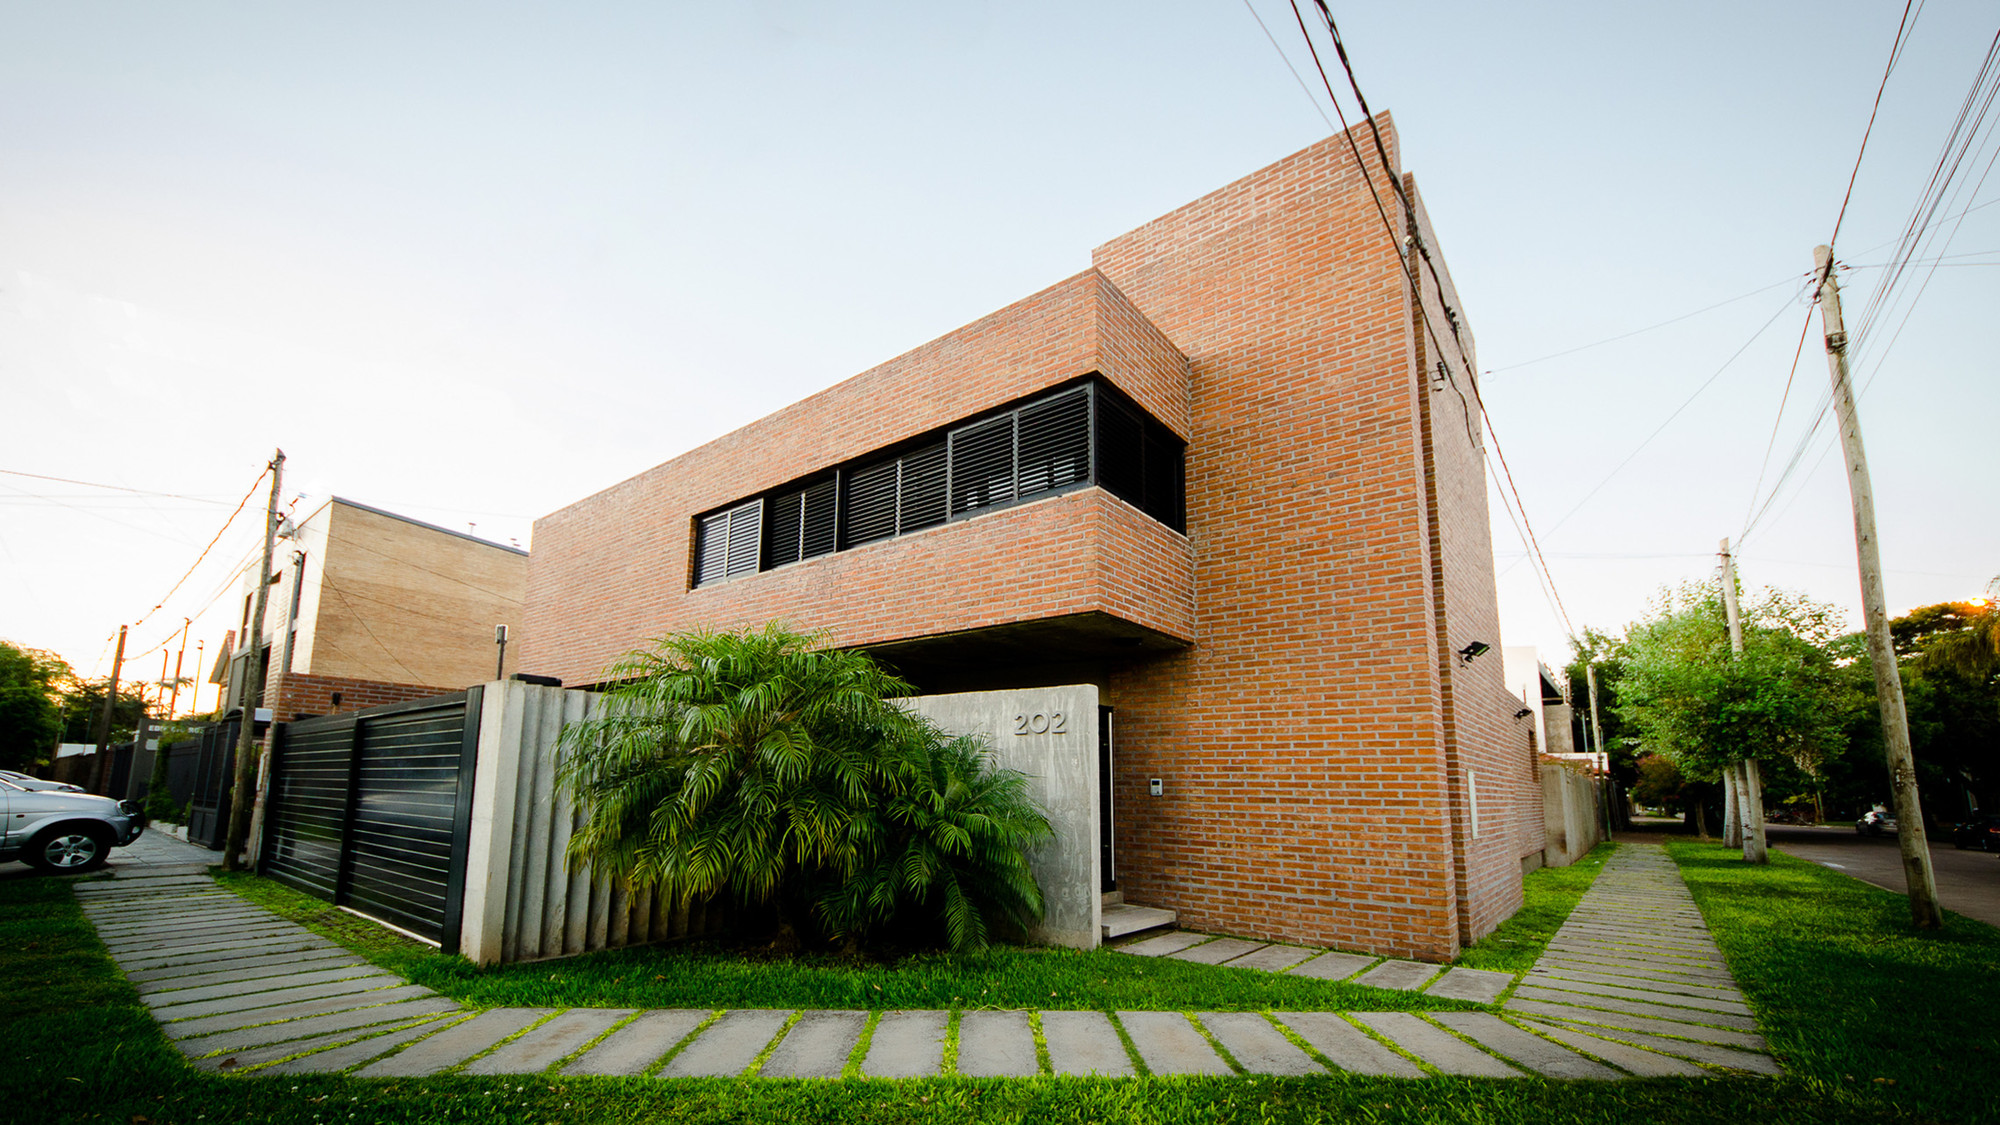 Casa en guadalupe mat as rizzi archdaily m xico for Casa de guadalupe